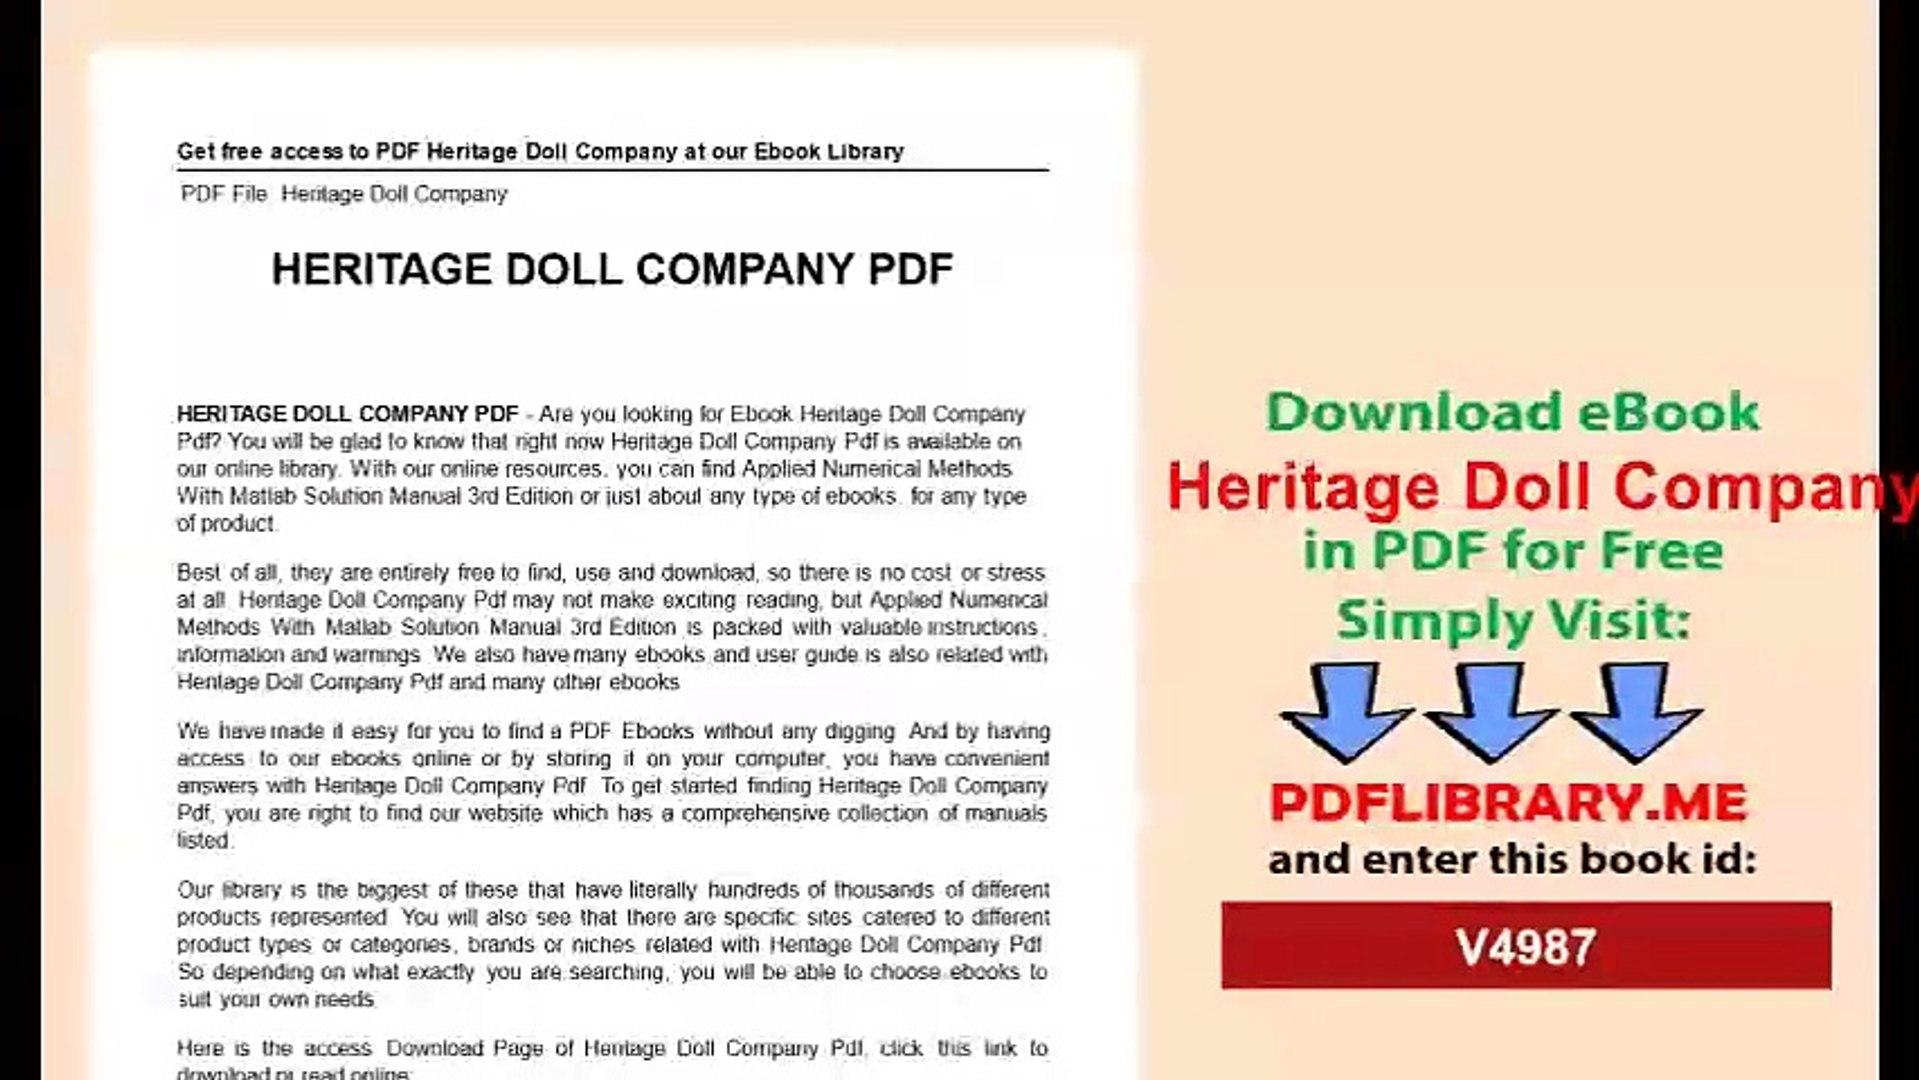 Heritage Doll Company